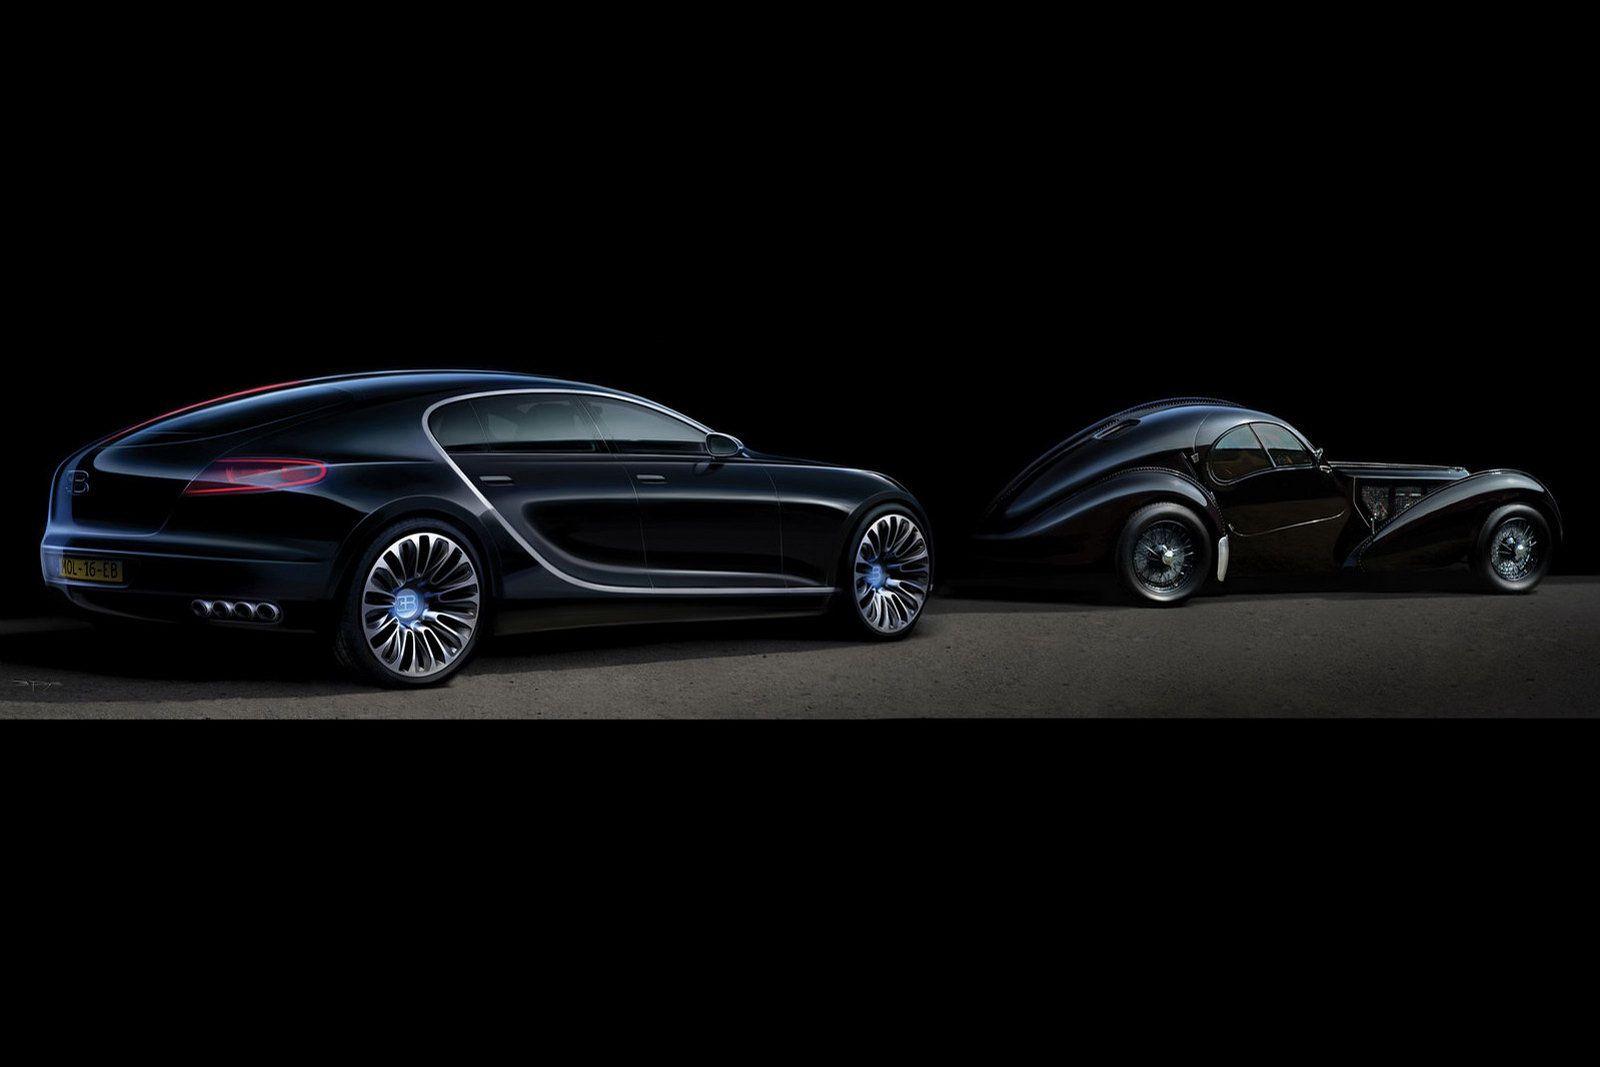 Captivating Bugatti 16C Galibier Nice Design